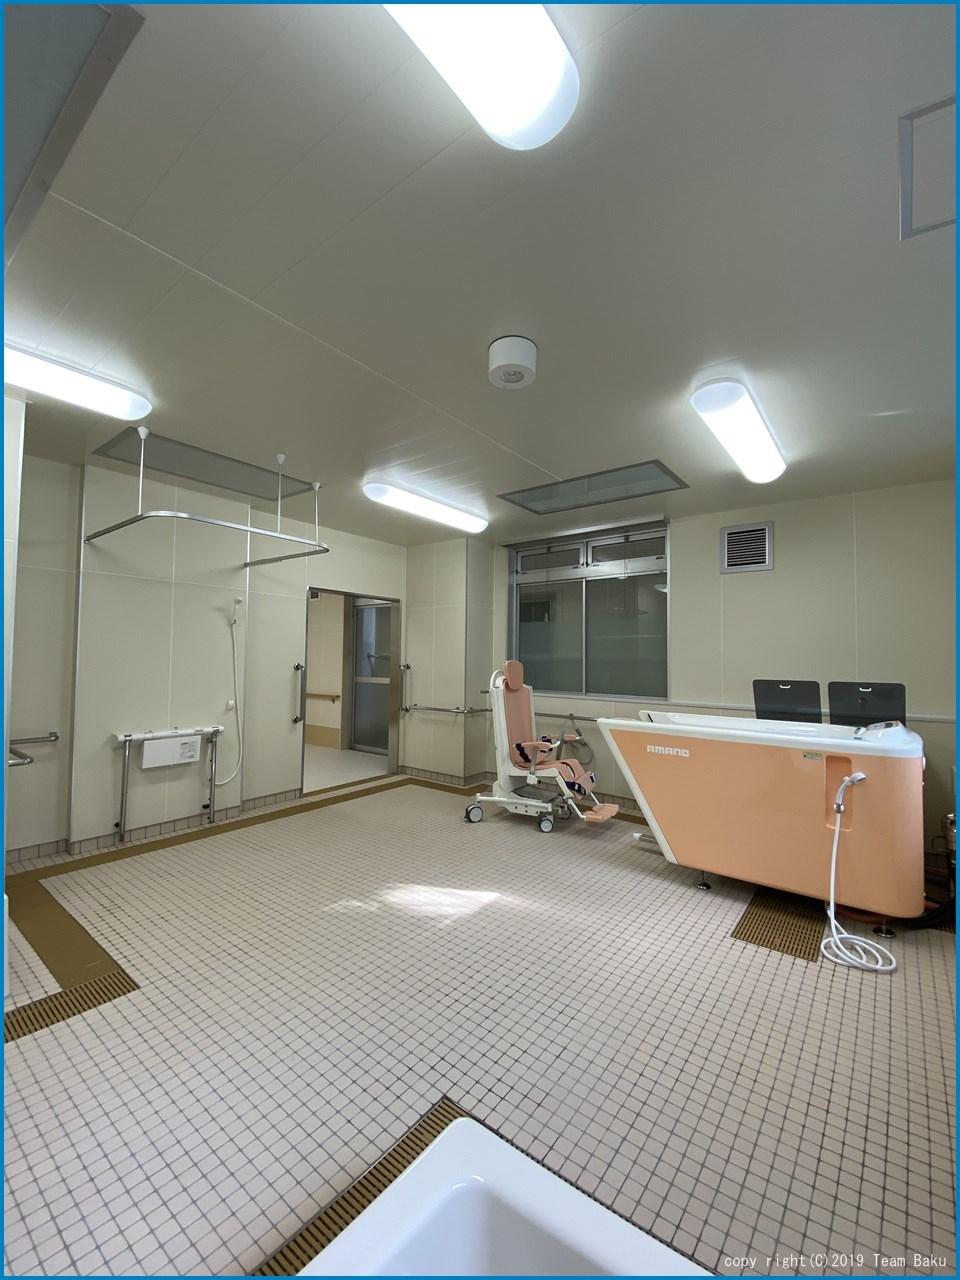 N病院グループ Nナーシング南館 改修・増築工事 5_c0376508_13043323.jpg